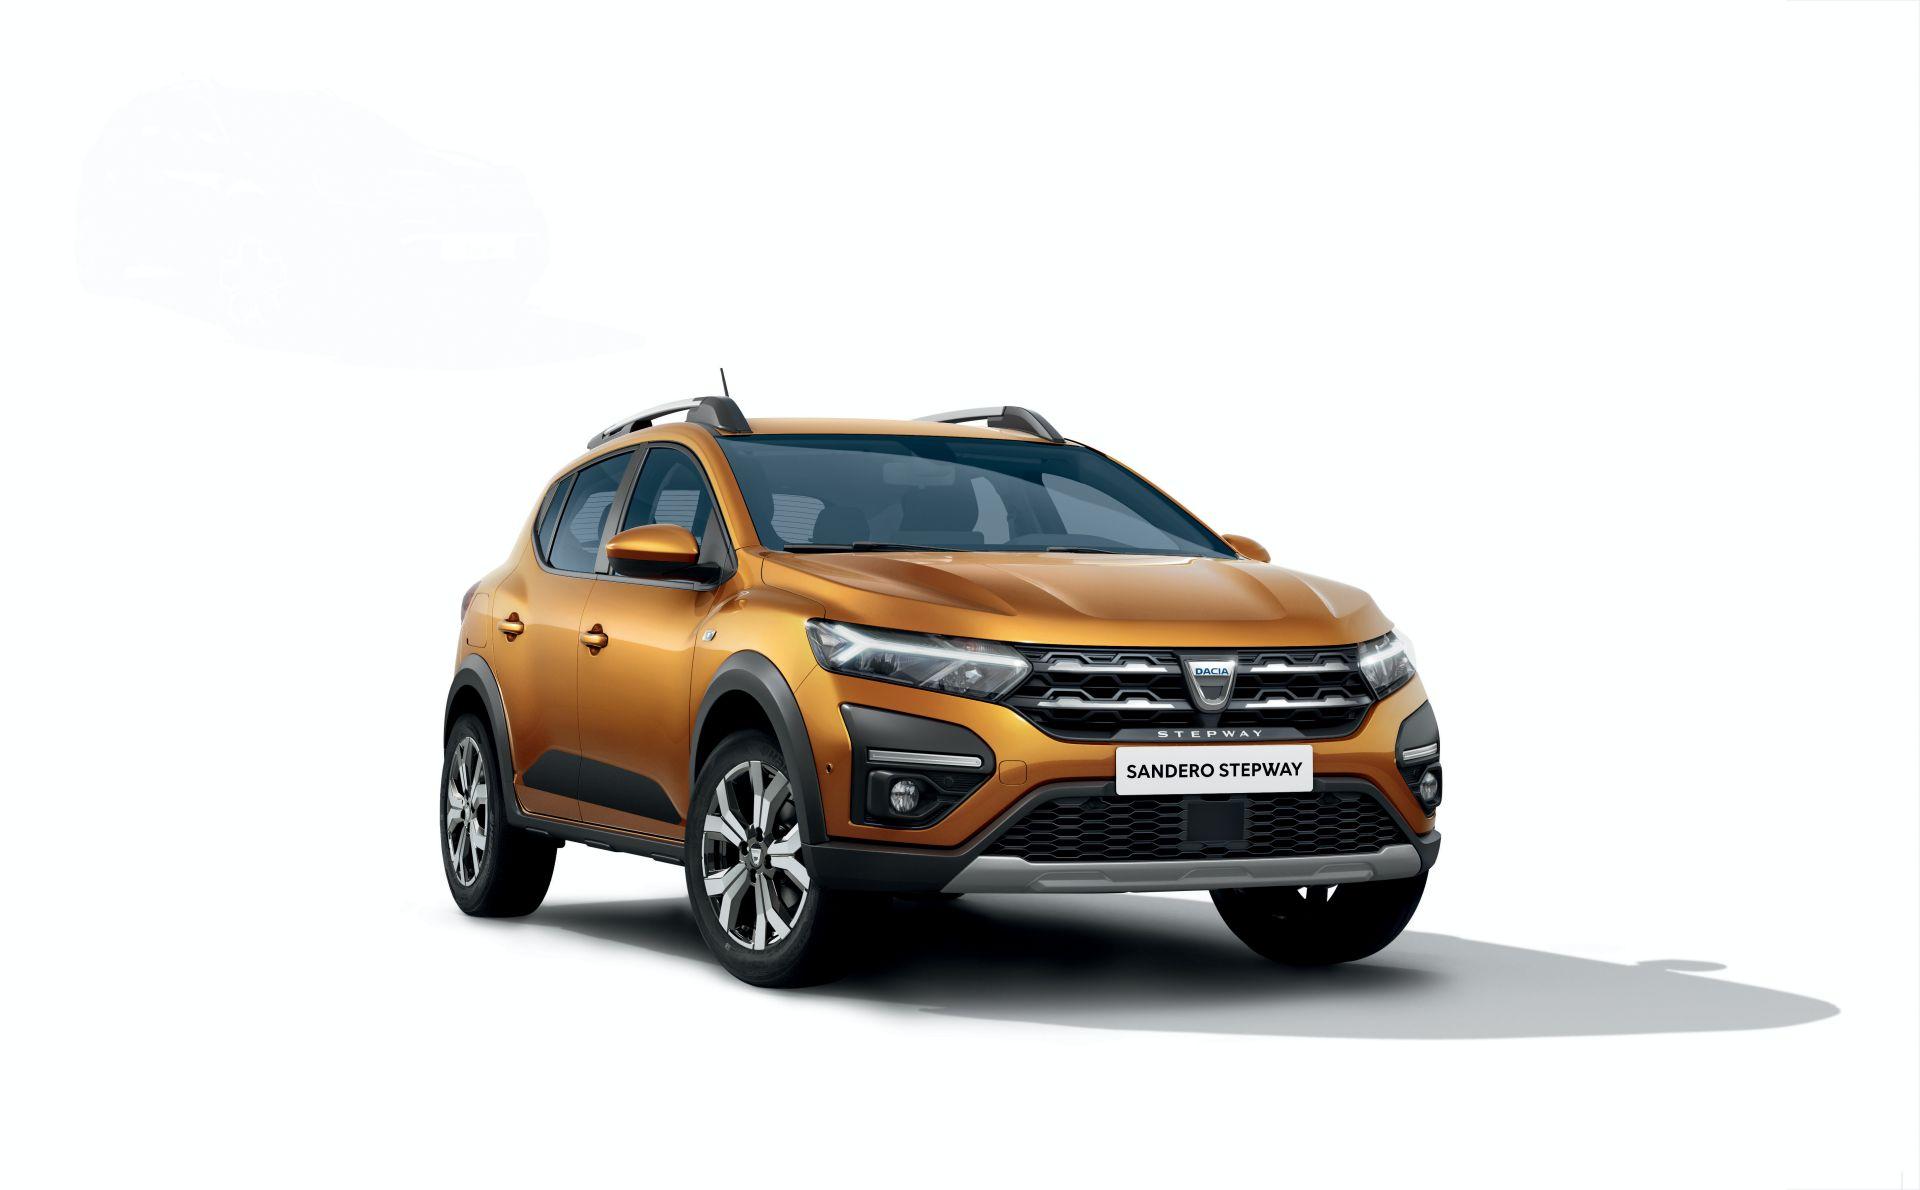 фото Renault Sandero Stepway 2021